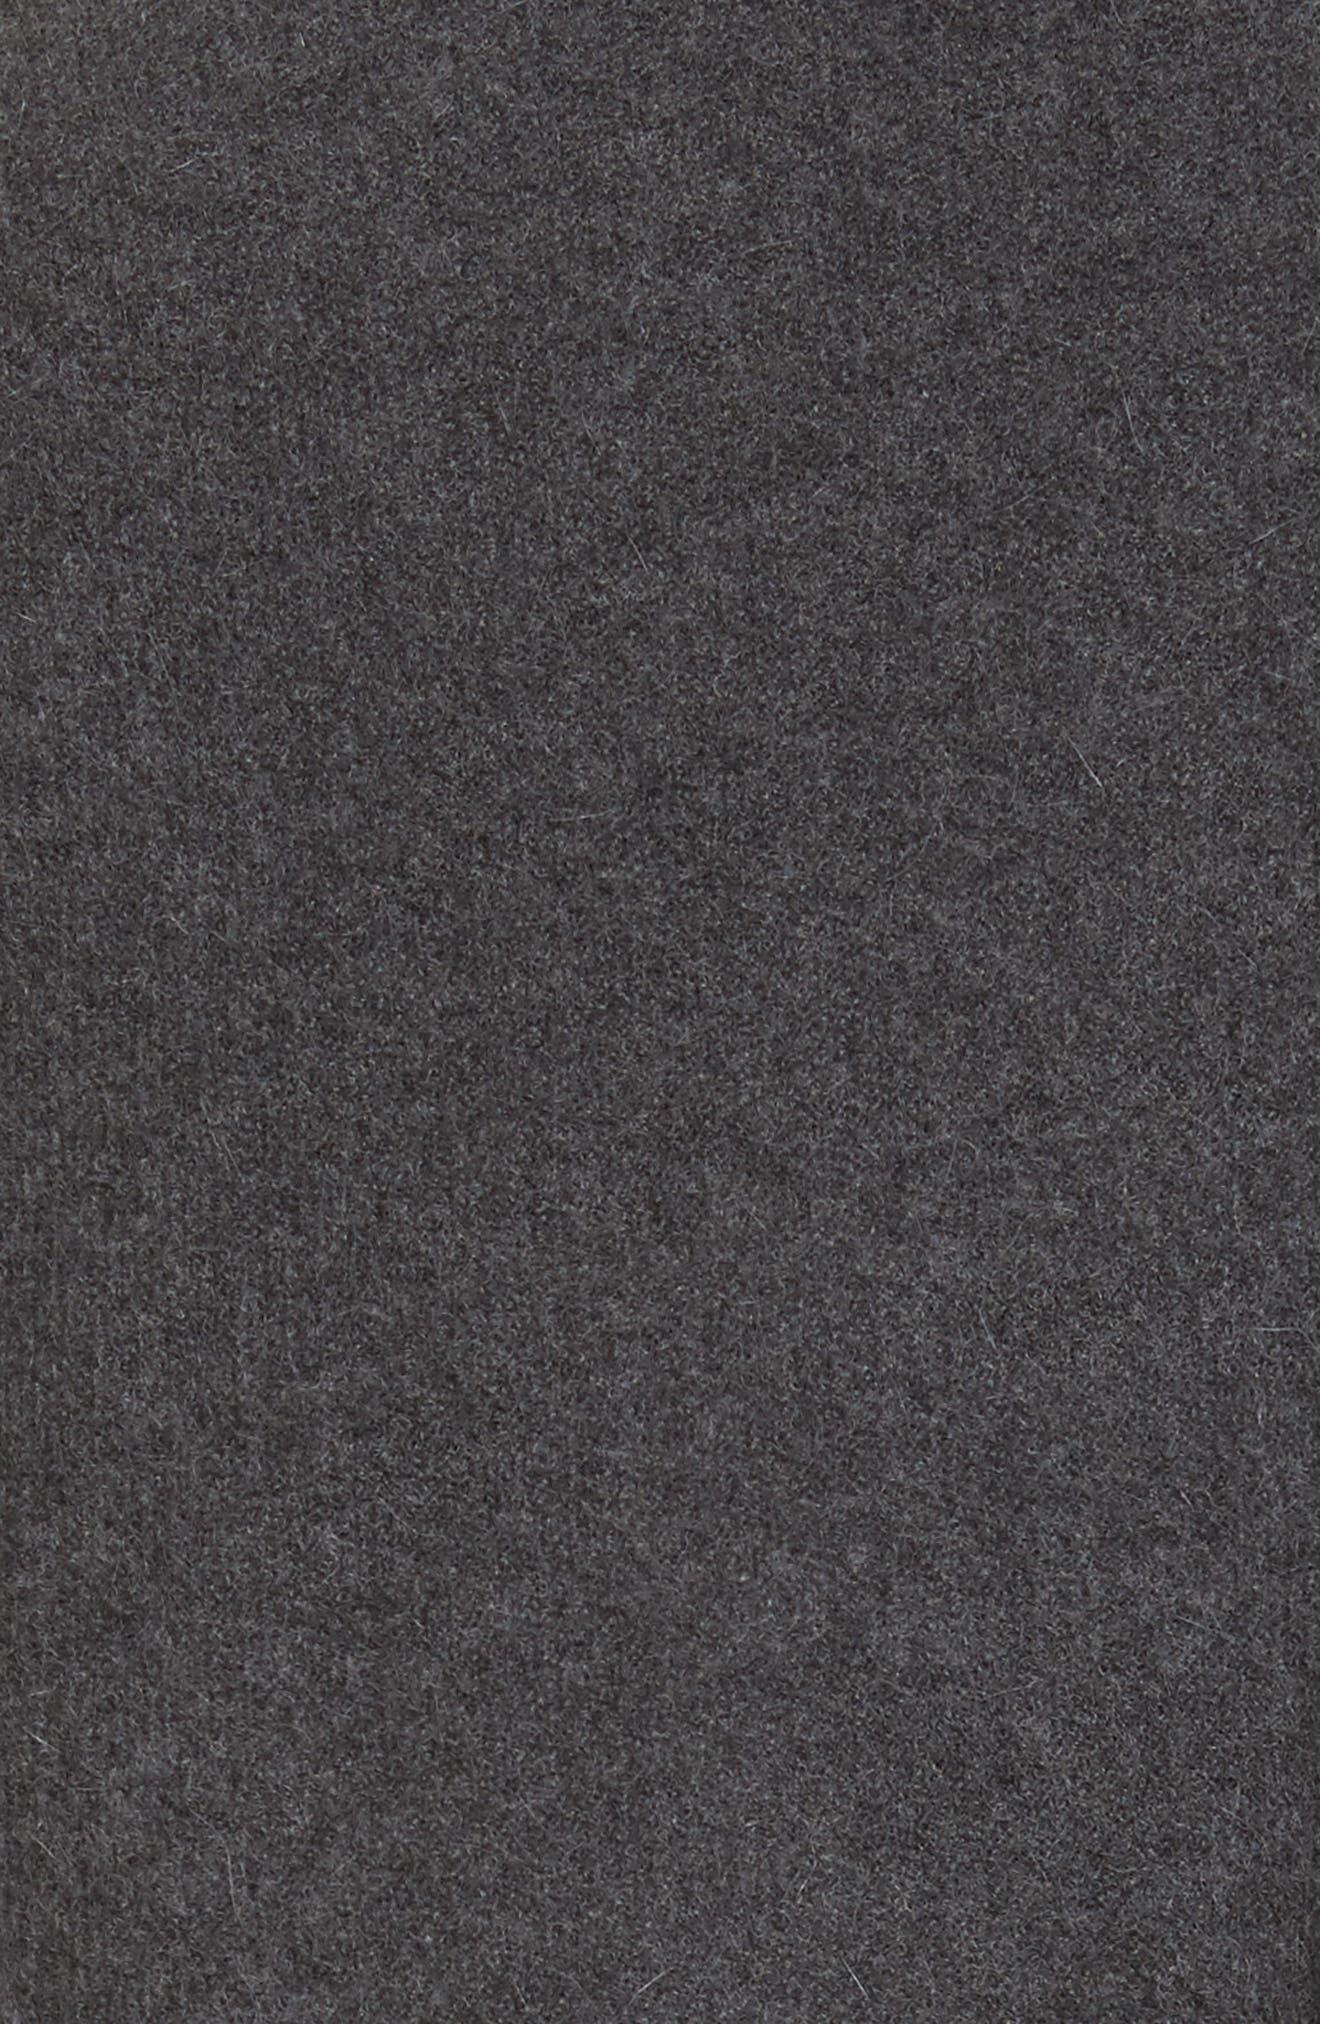 Sorin Merino Wool Blend Wrap Vest,                             Alternate thumbnail 5, color,                             Shale Melange